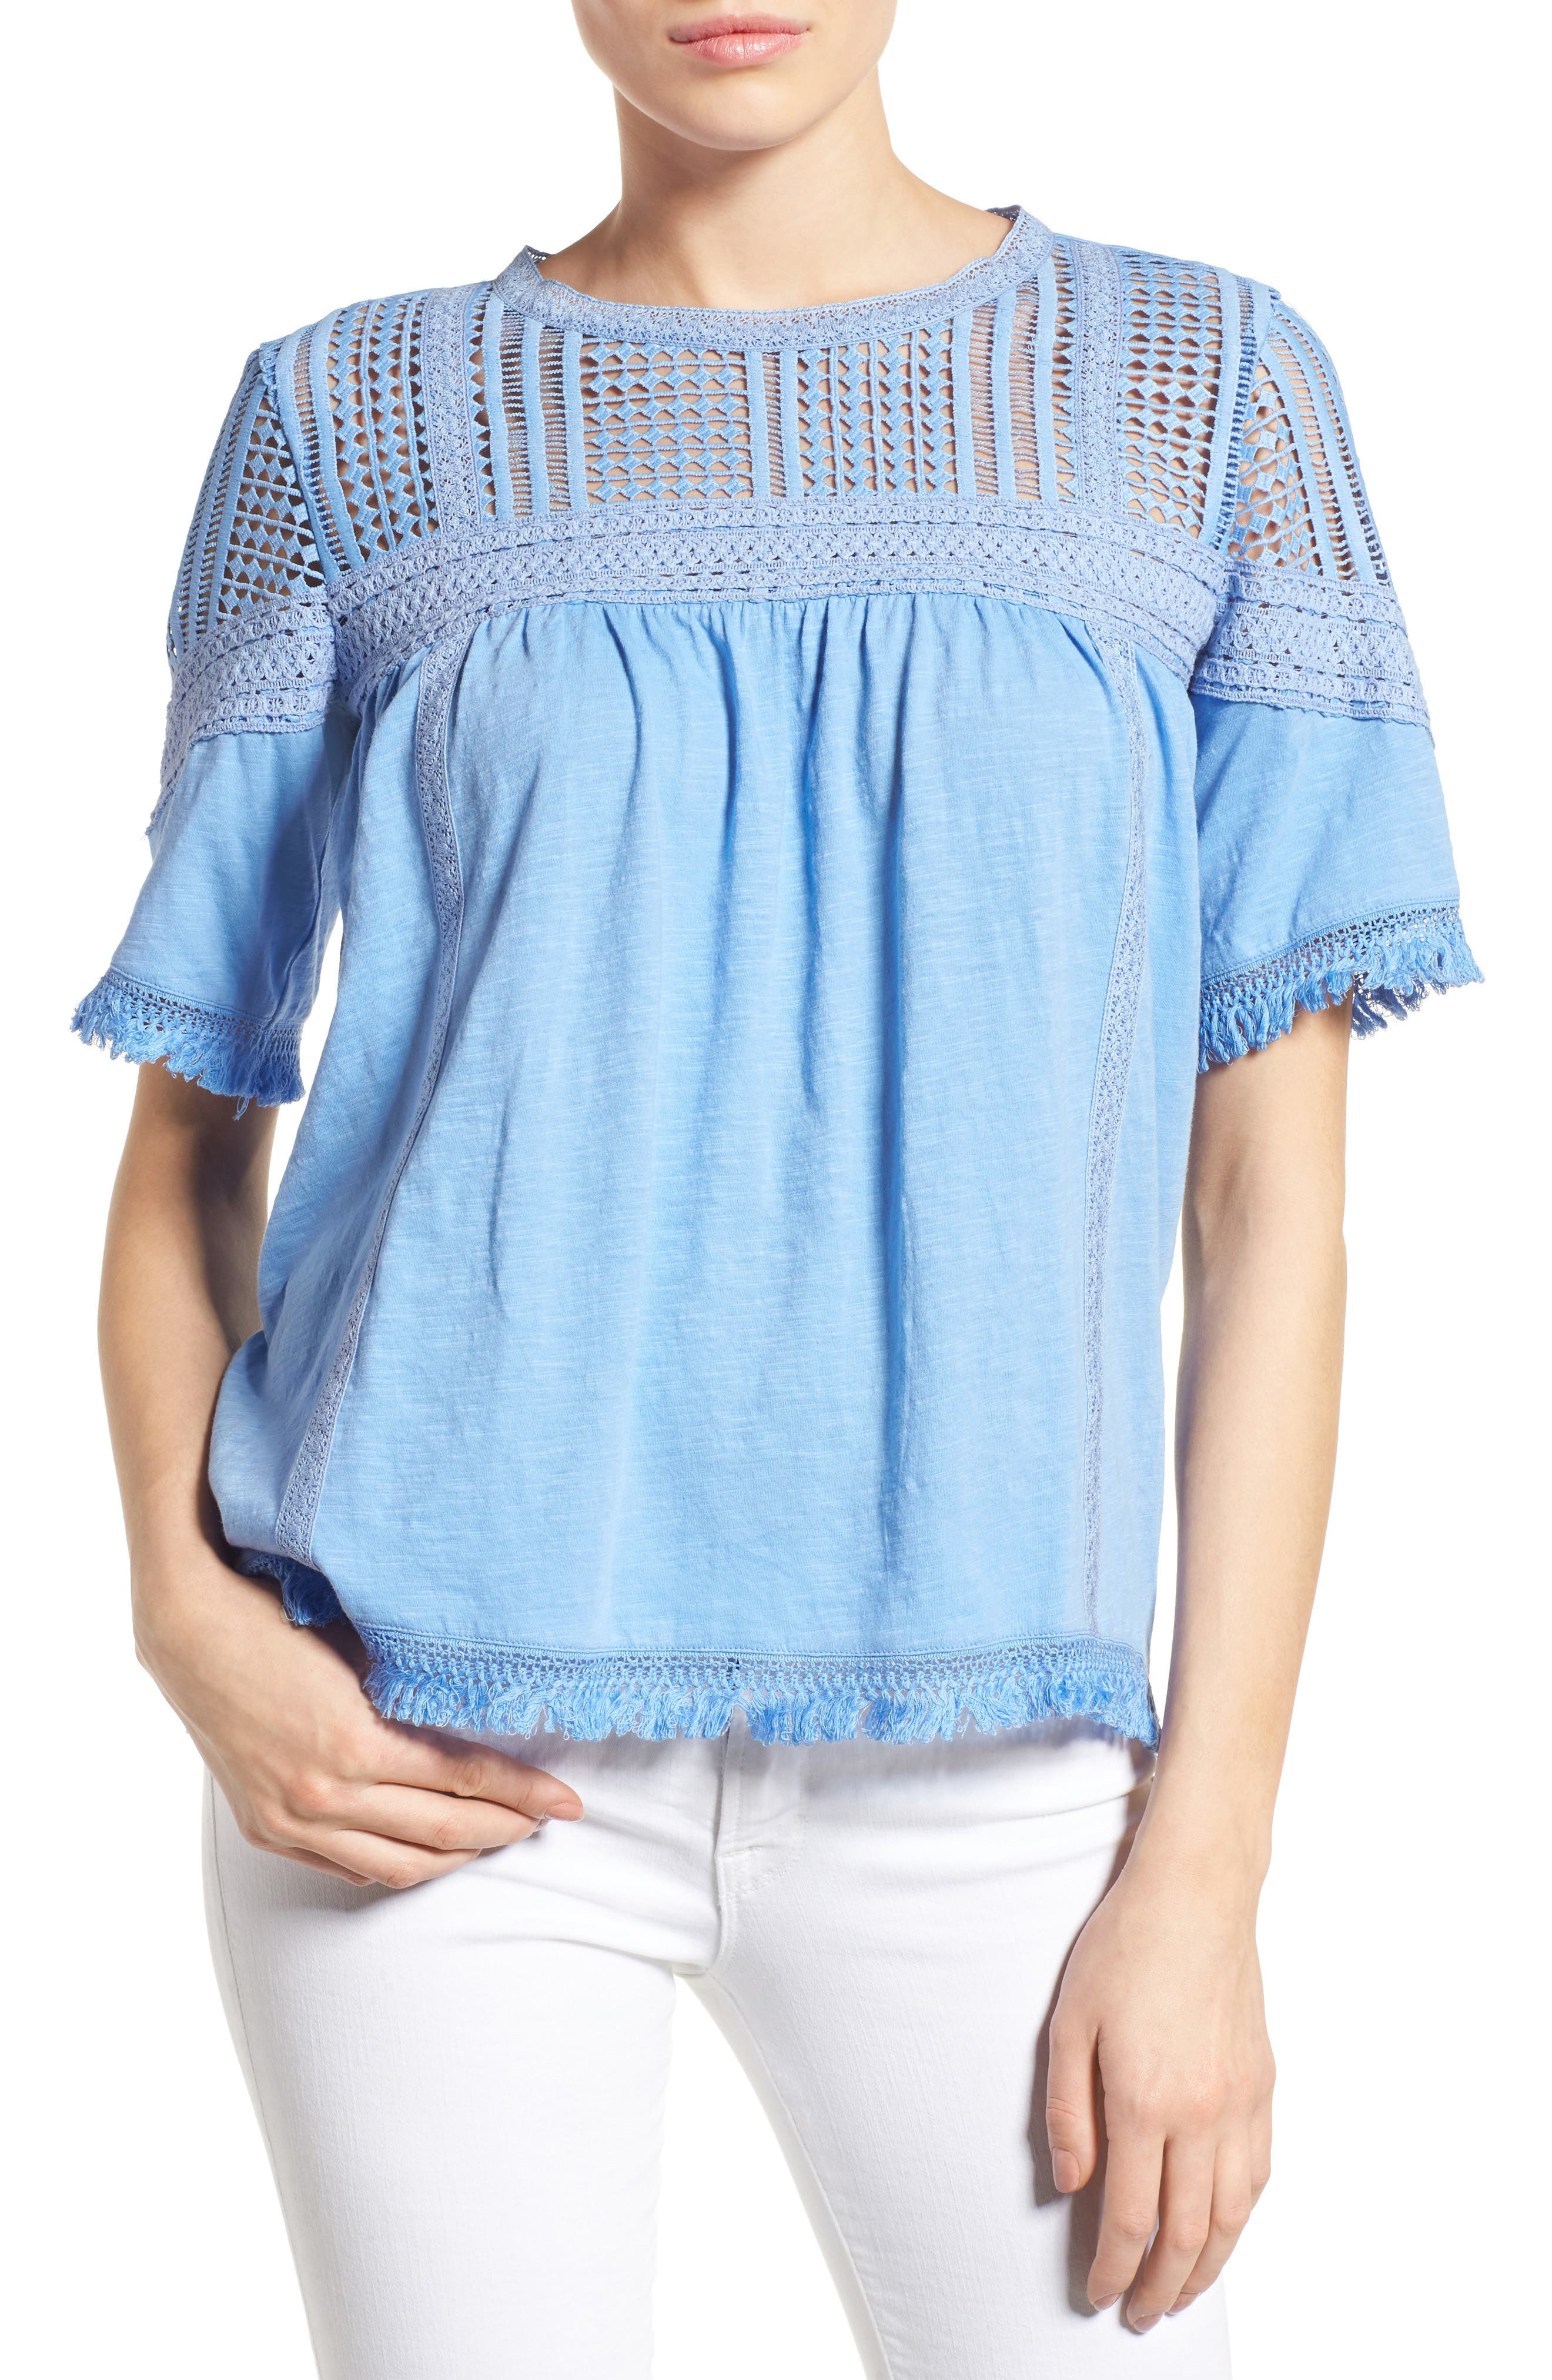 Alternate Image 1 Selected - Caslon® Fringed Lace & Knit Tee (Regular & Petite)